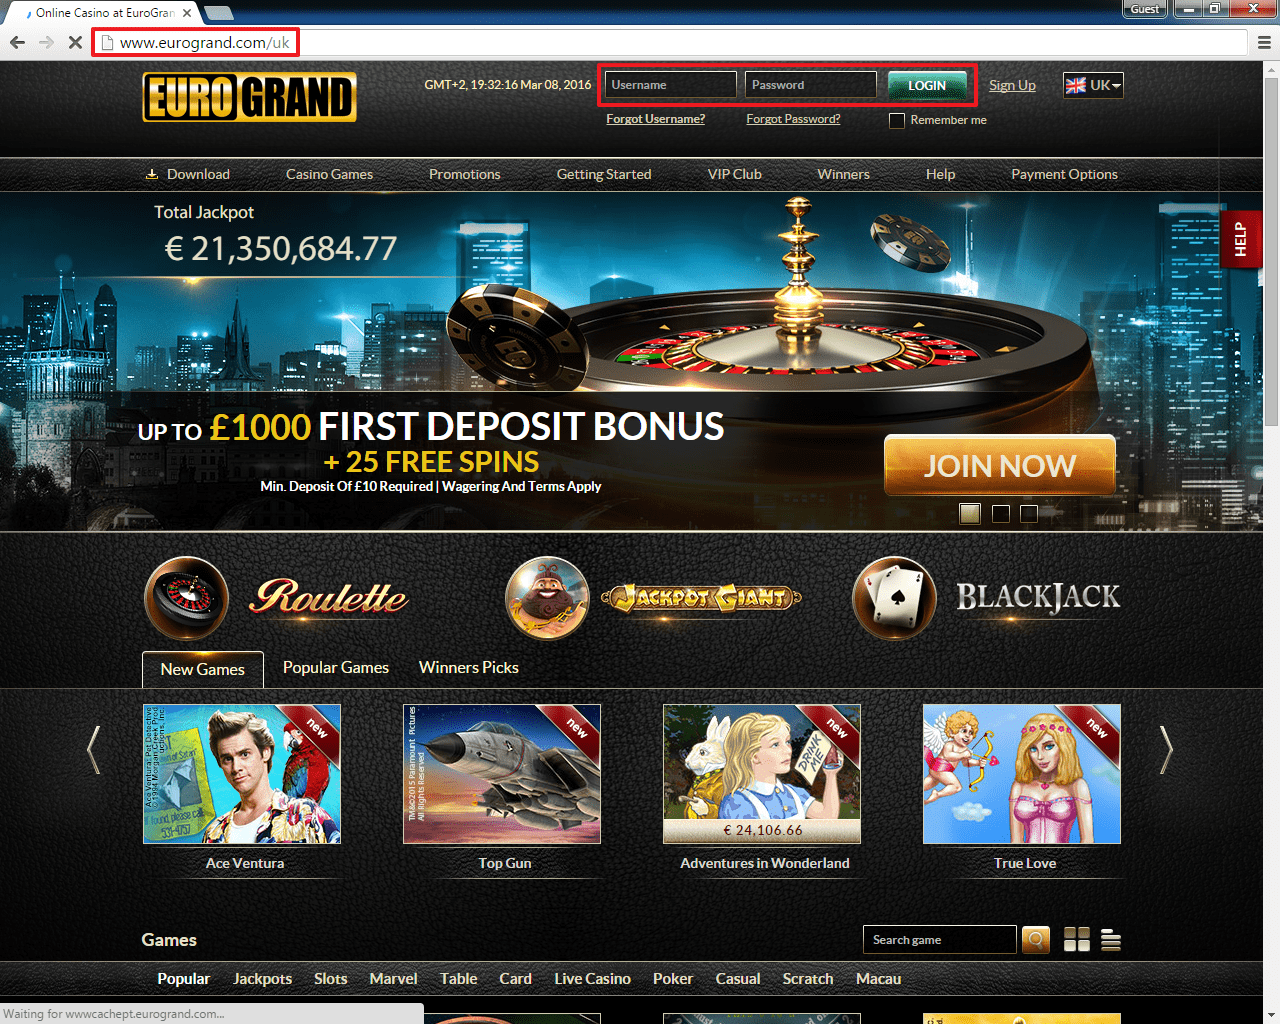 Casino min deposit 10